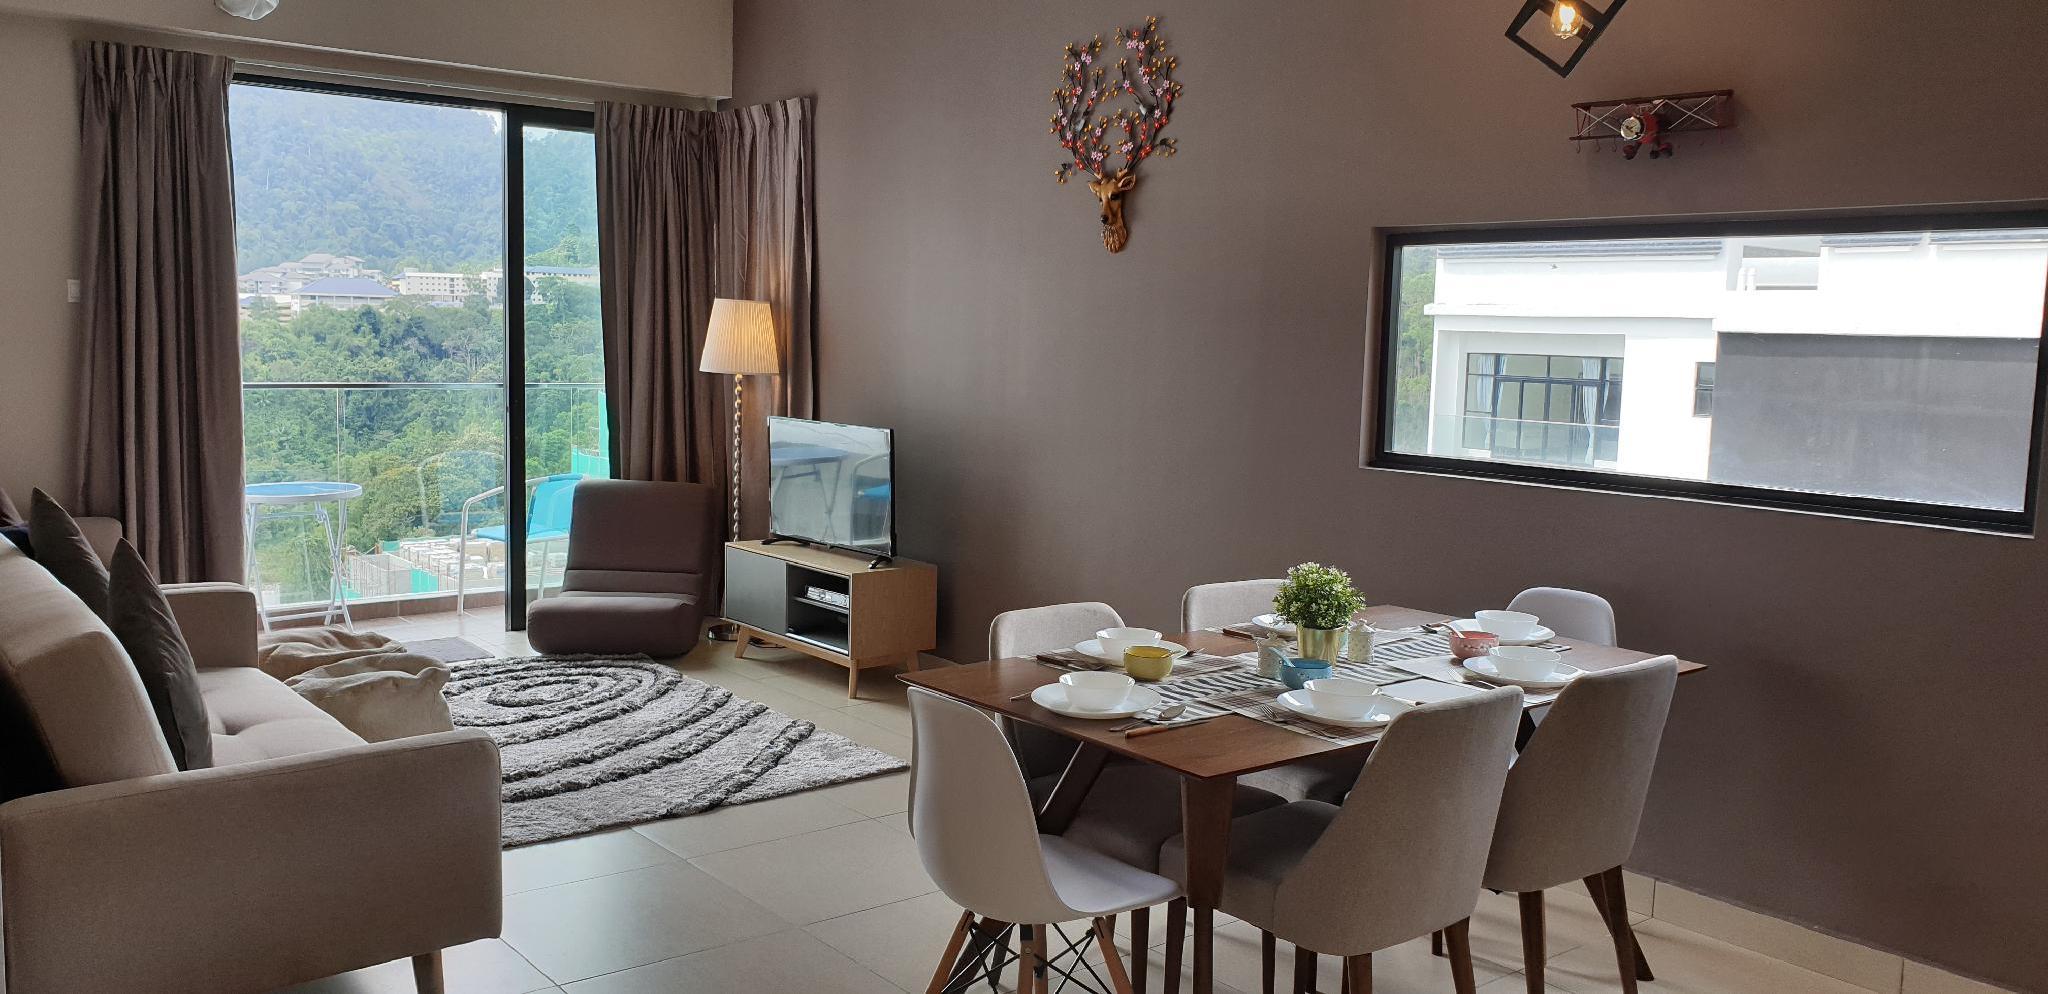 10Pax Luxury Resort Family Suite Genting Highlands